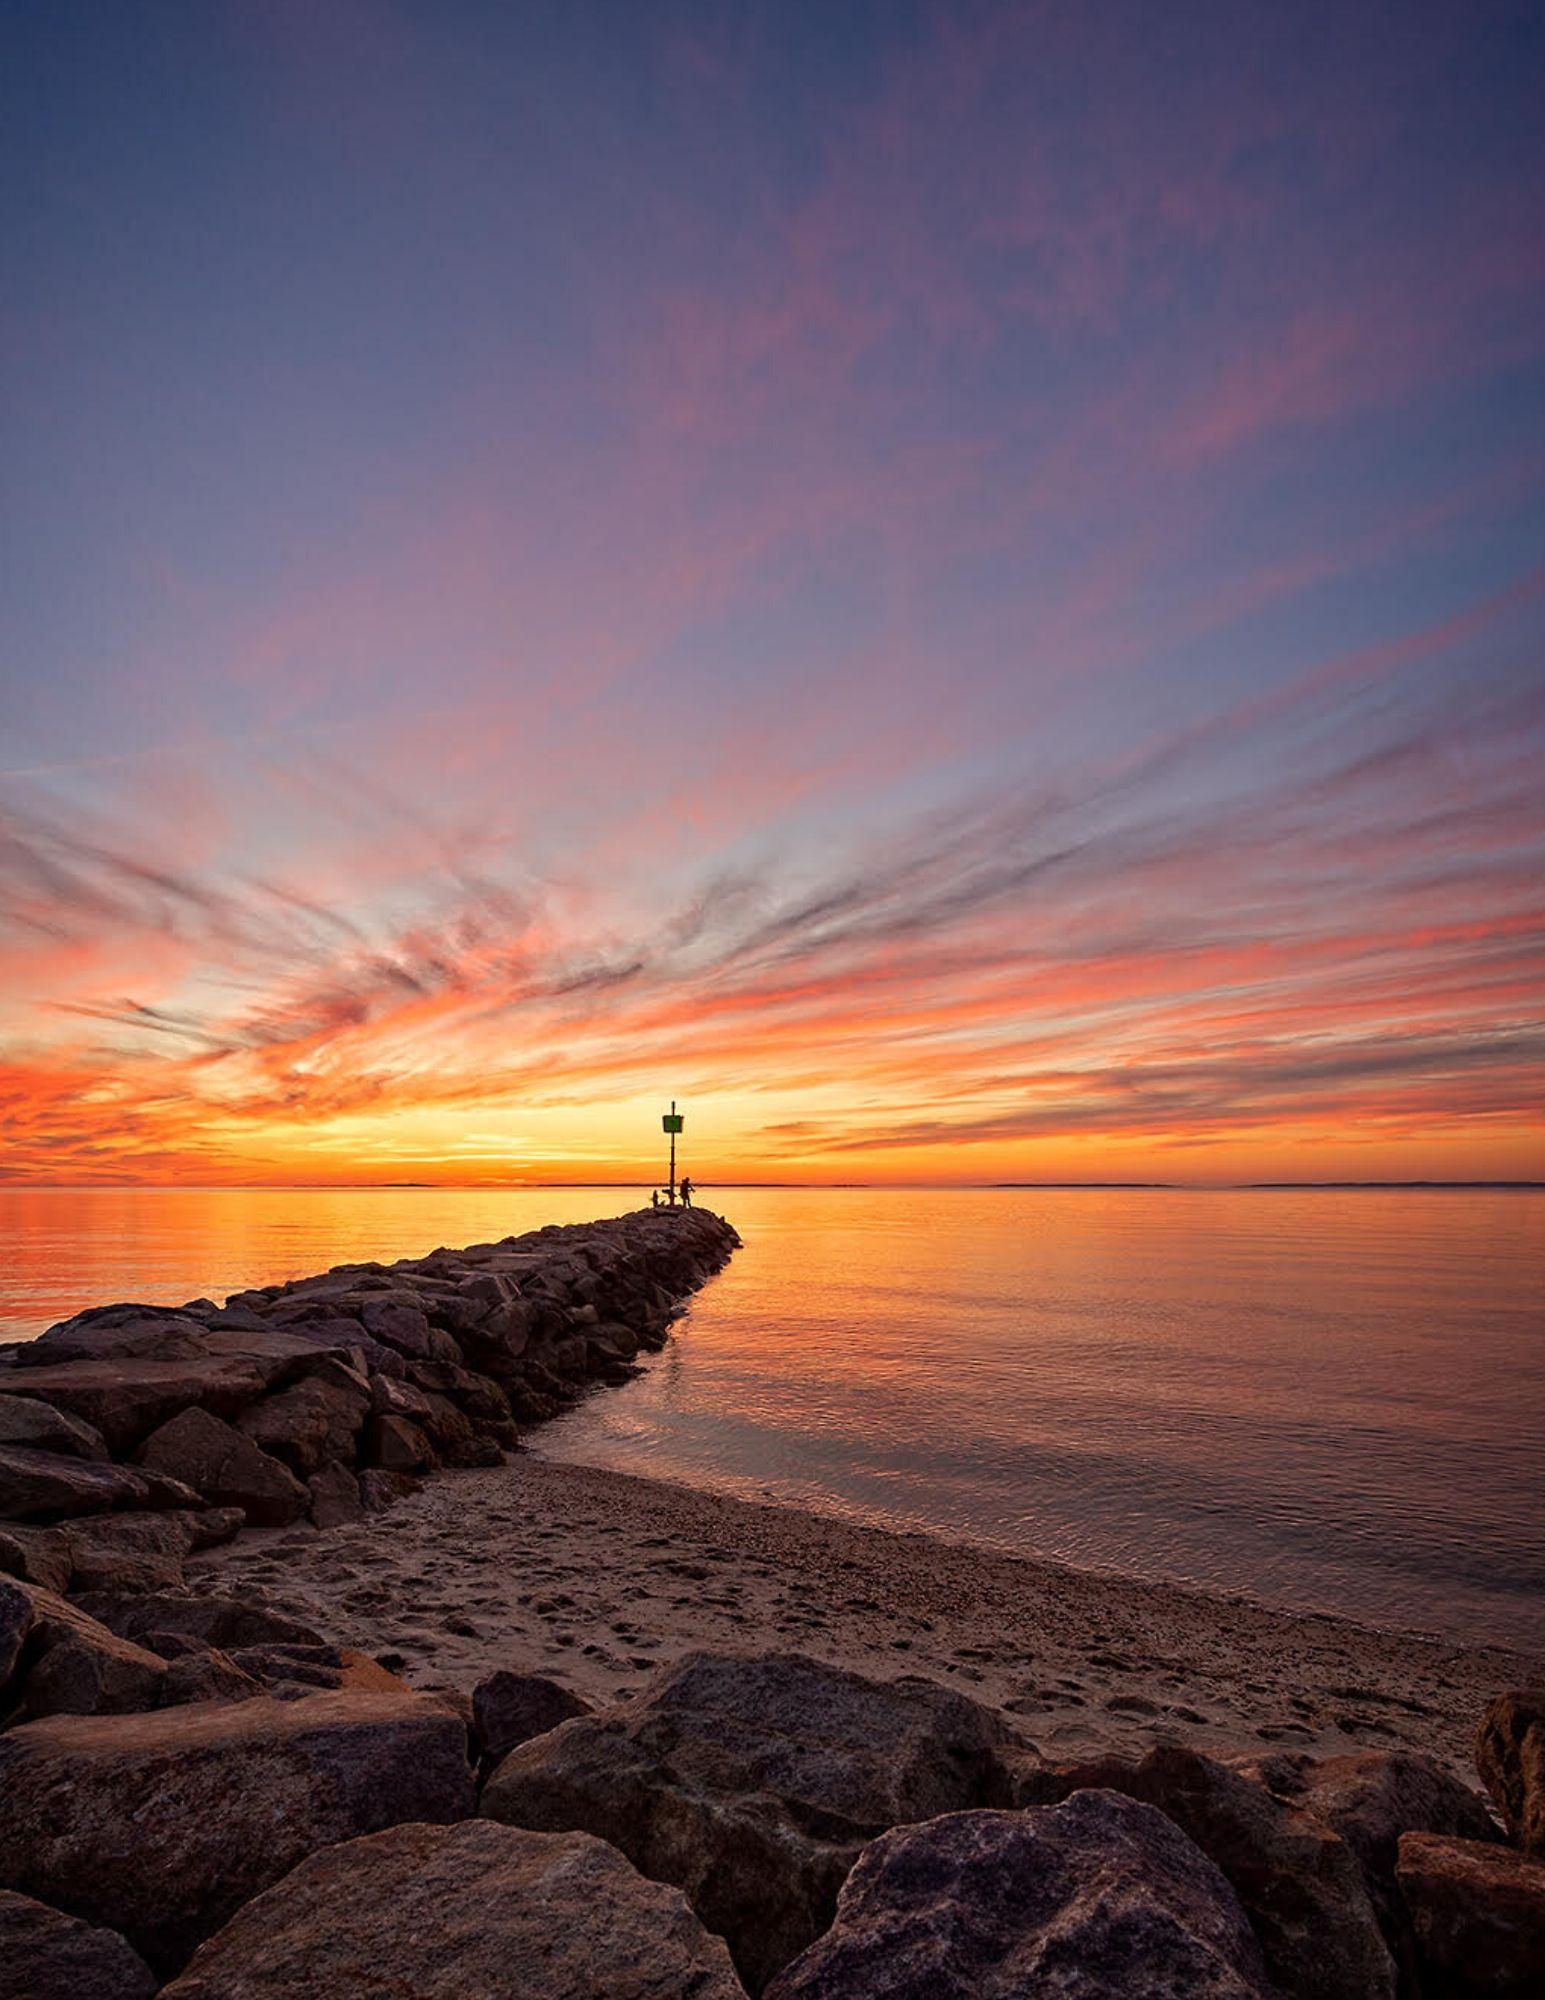 John Montes Jr Photography Best Places to Photograph Sunrise and Sunset on Marthas Vineyard-Best Places to Photograph Sunrise and Sunset on Marthas Vineyard-14